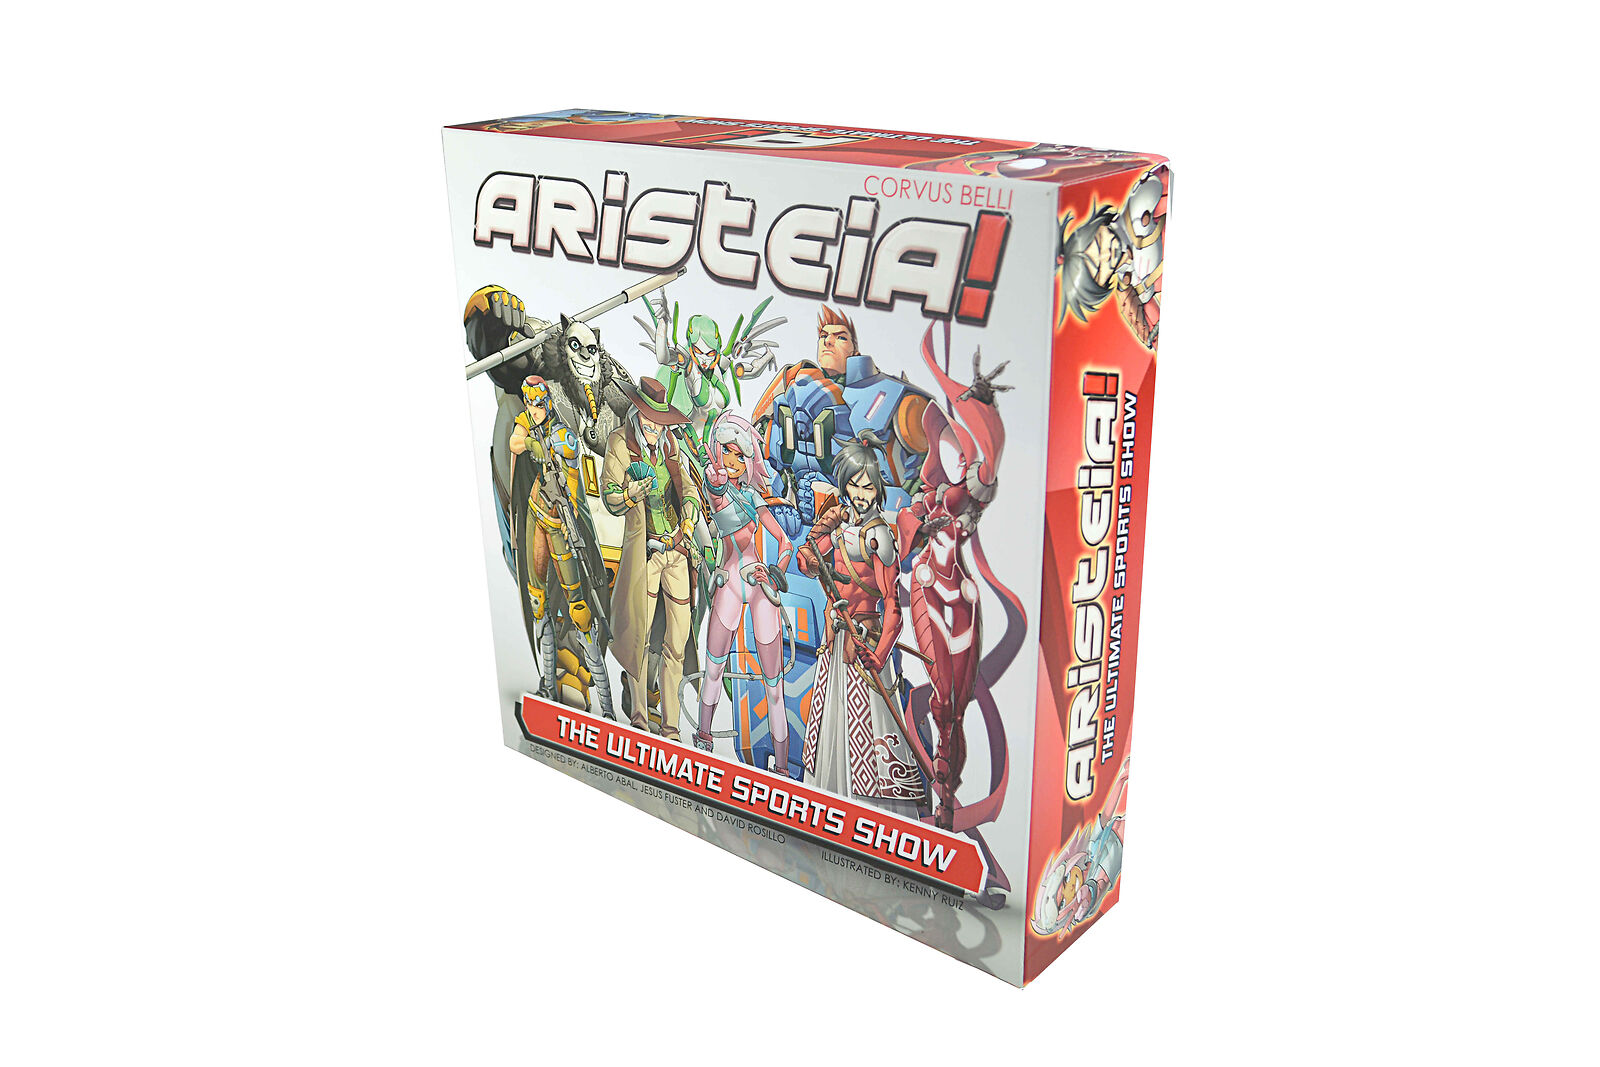 Corvus Belli Infinity Entièrement neuf dans sa boîte aristeia  Core jeu (Fr) cbari 00